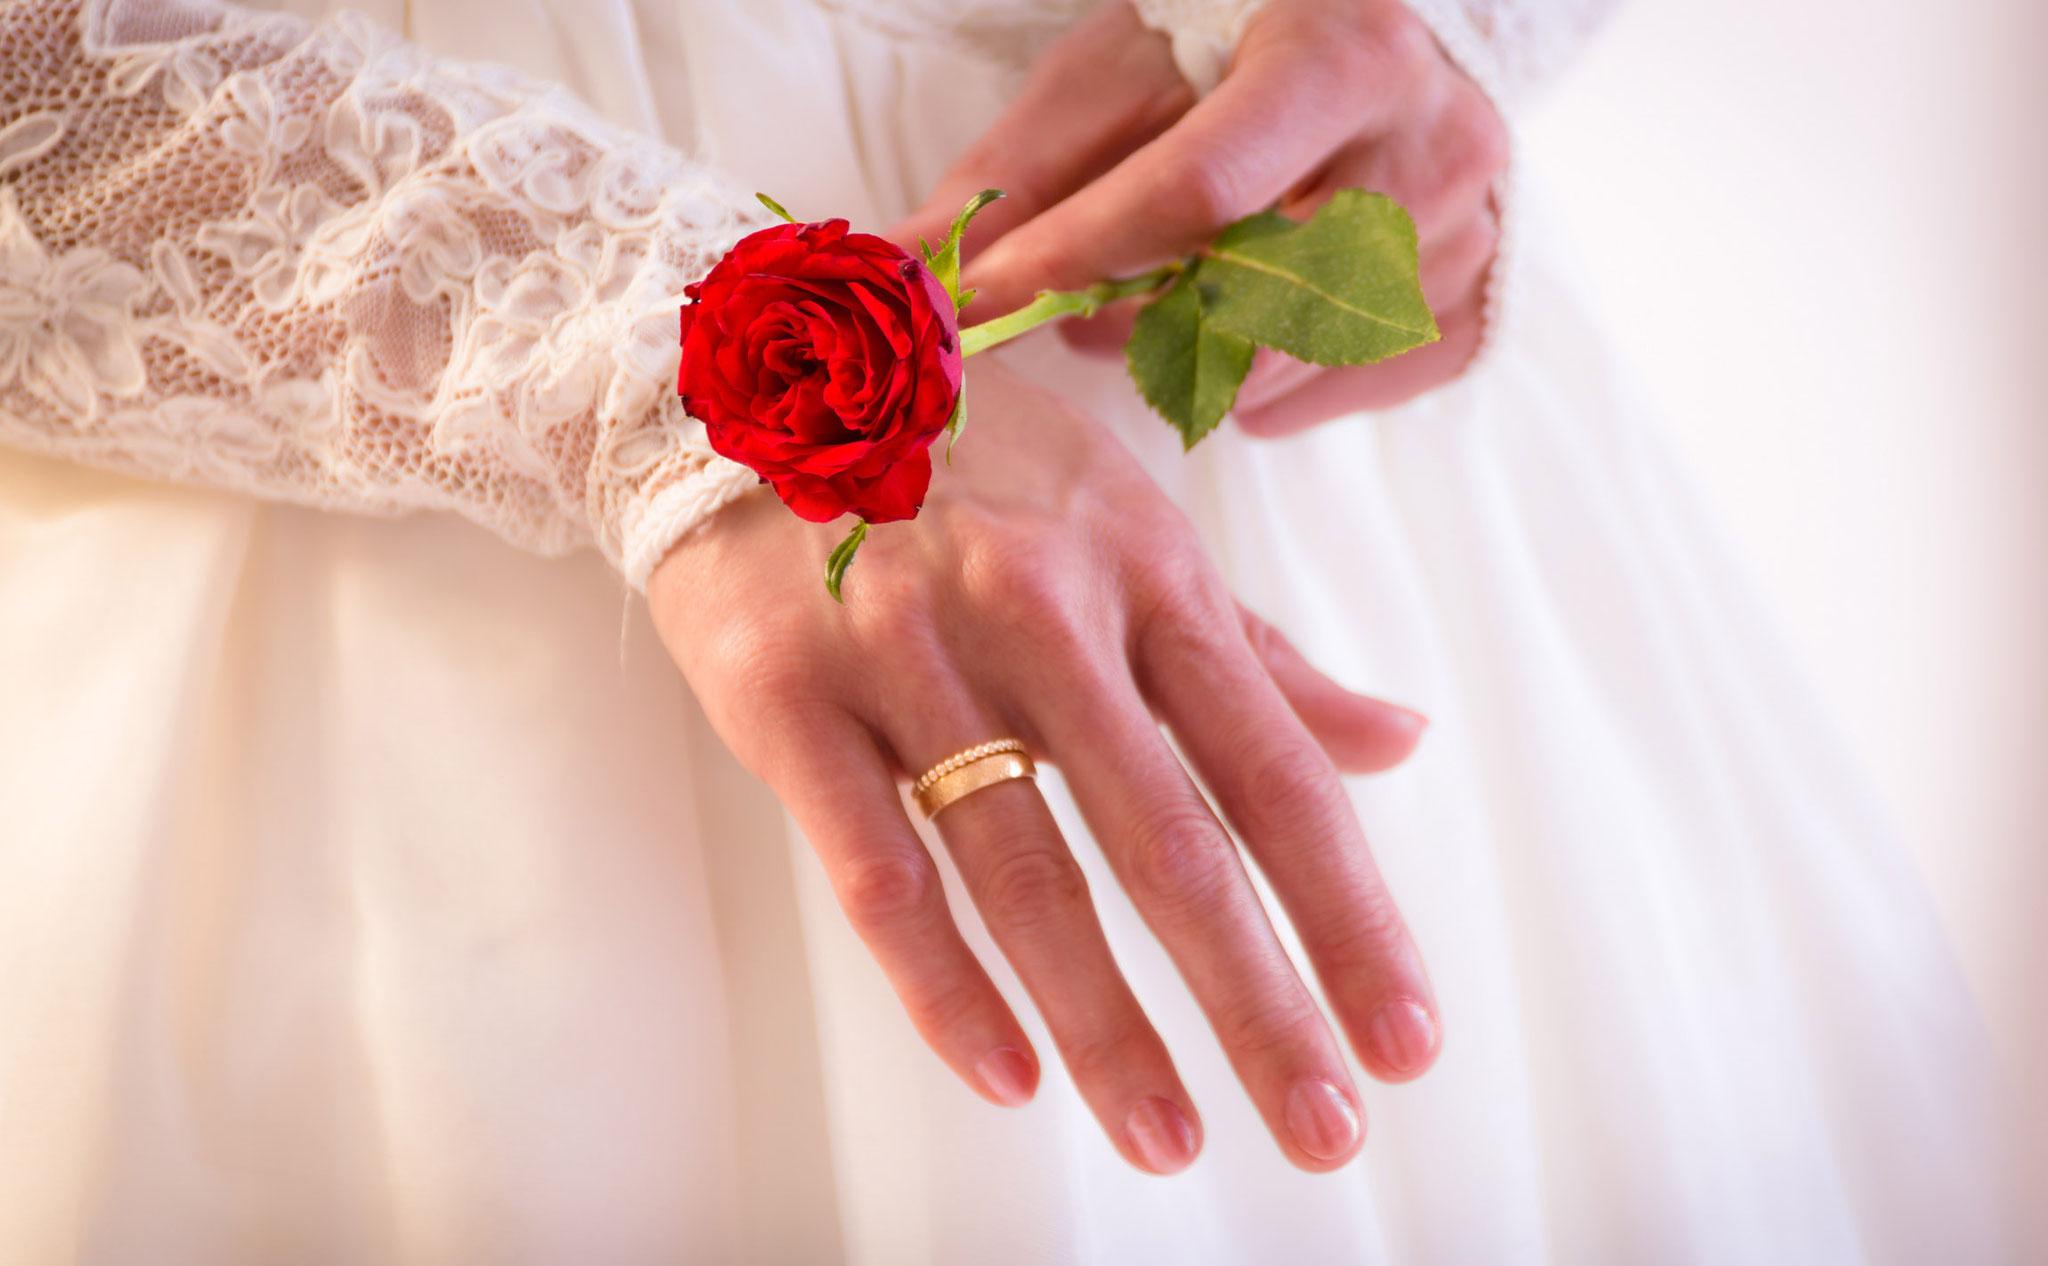 Braut-Fotoshooting mit roter Rose - Werbefotograf Erlangen